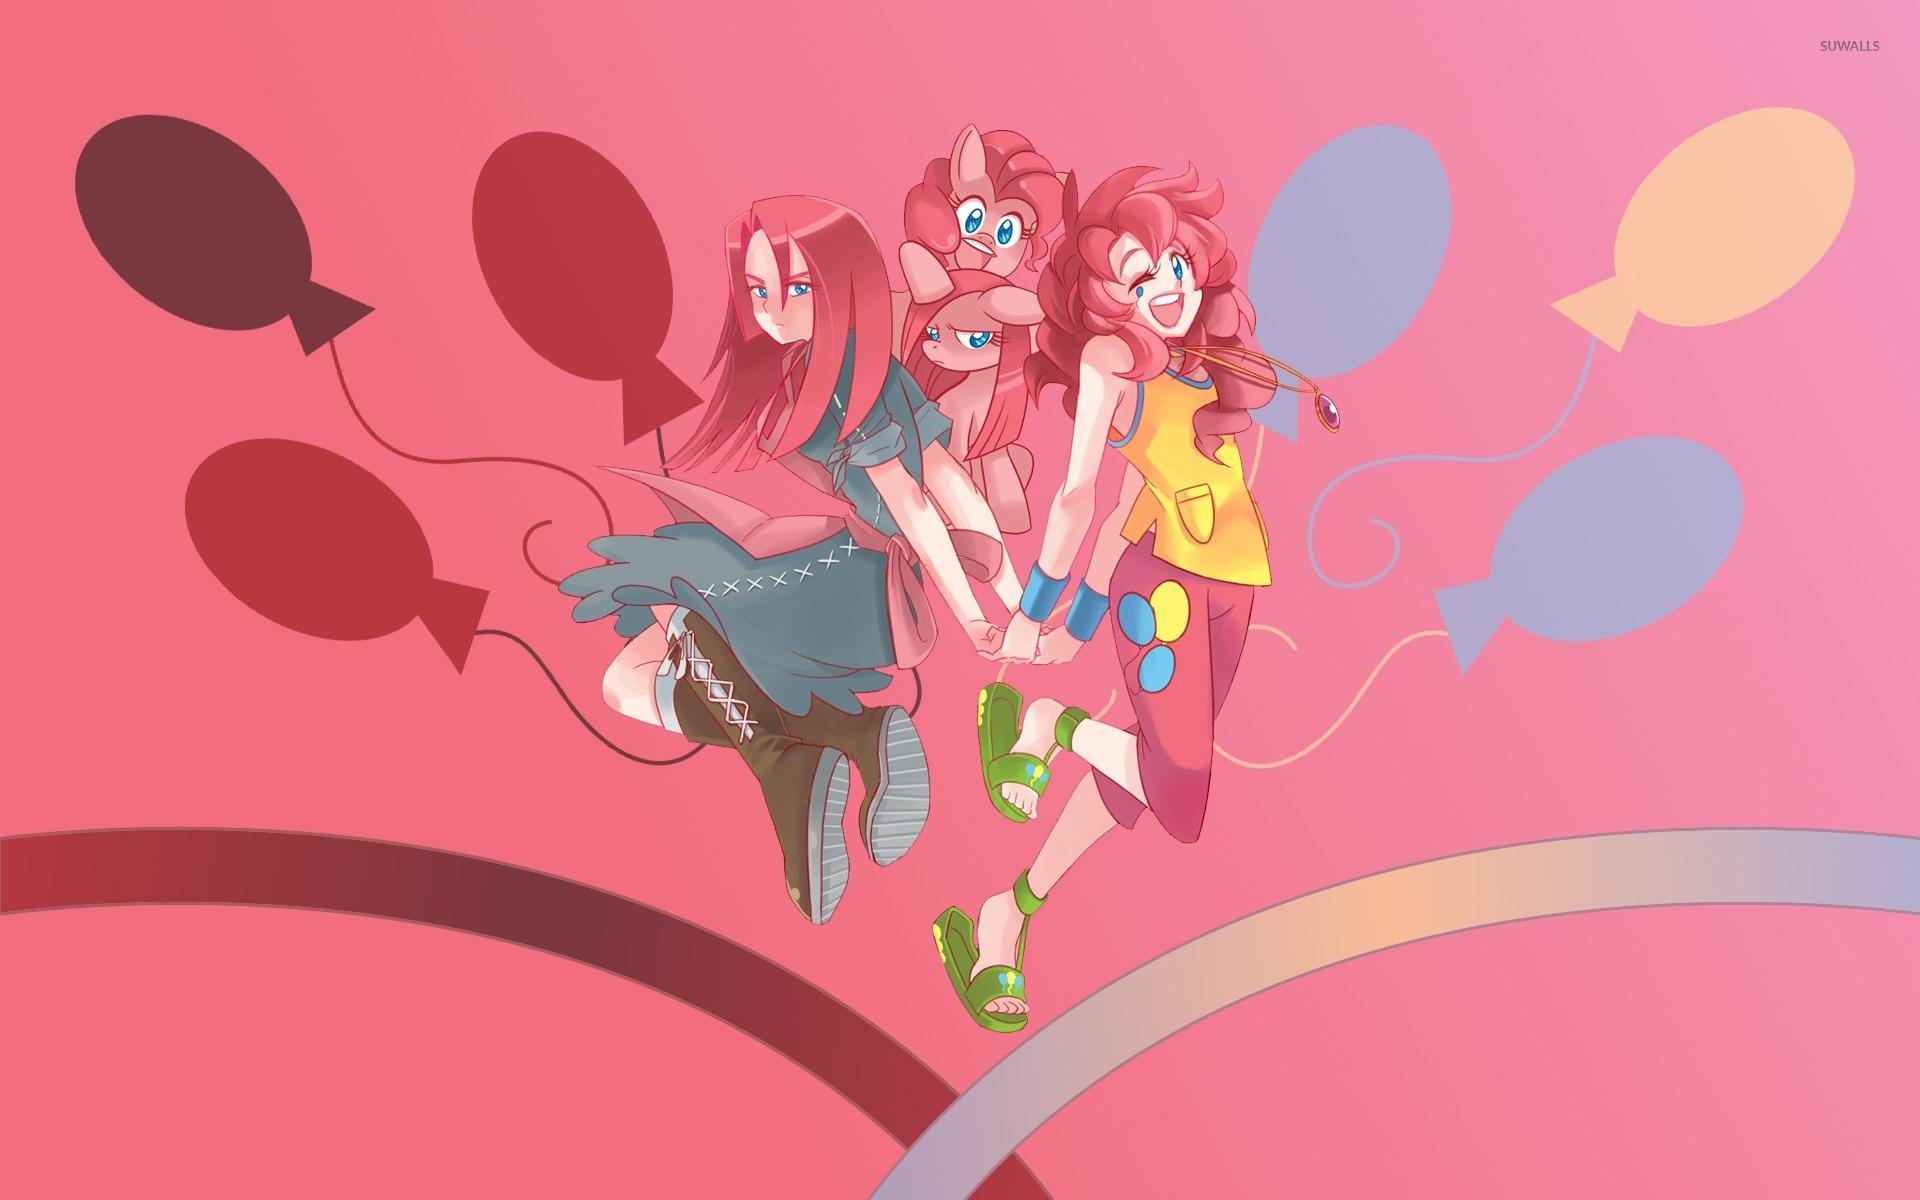 My Little Pony Equestria Girl Wallpaper Hd Pinkie Pie And Her Equestria Girl Wallpaper Cartoon